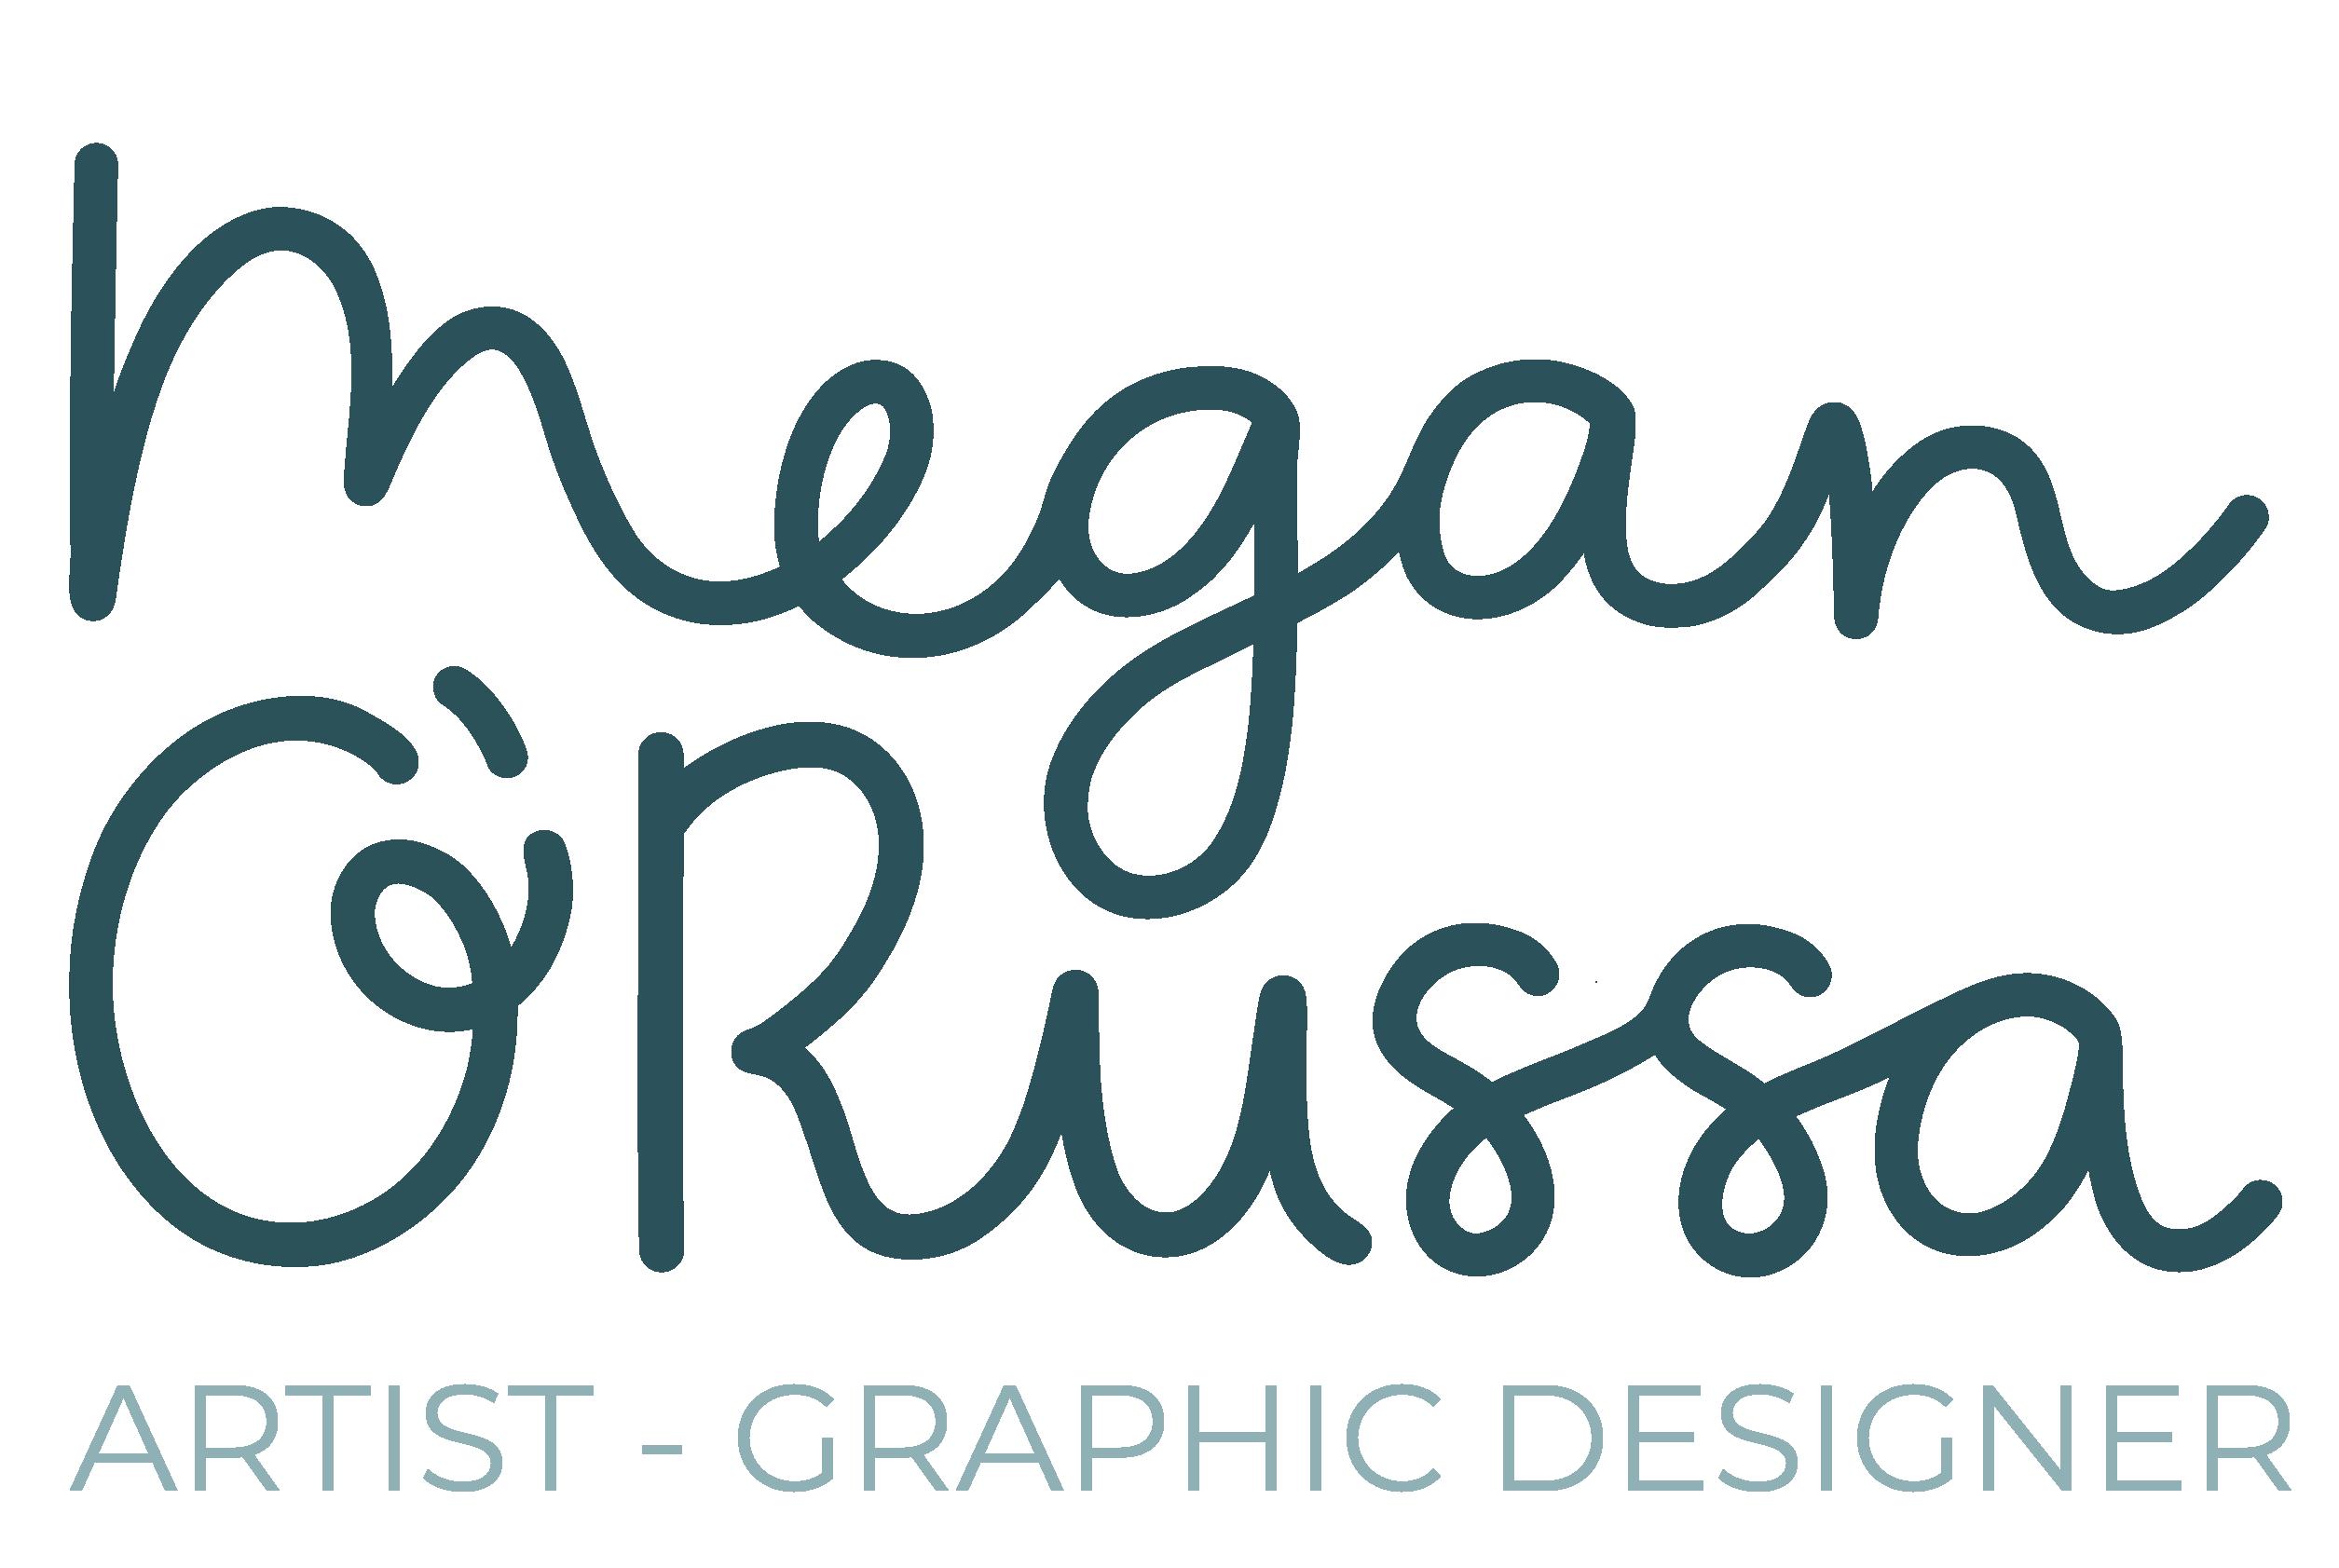 Megan O'Russa